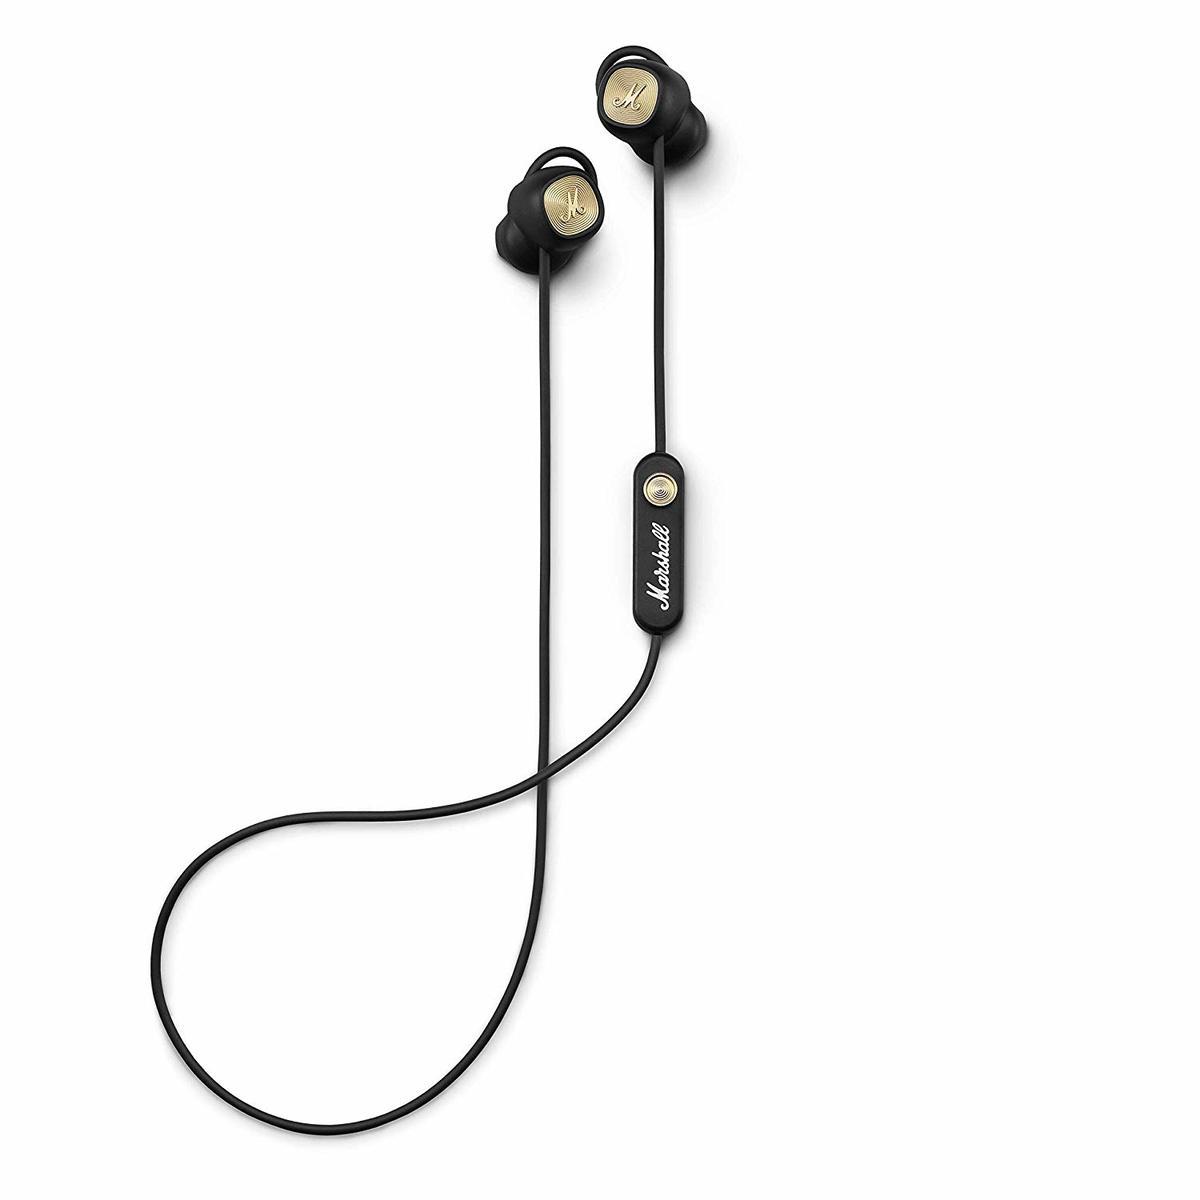 Minor 2 藍牙5.0 APTX無線 14.2 mm dynamic drivers 入耳式耳機黑色